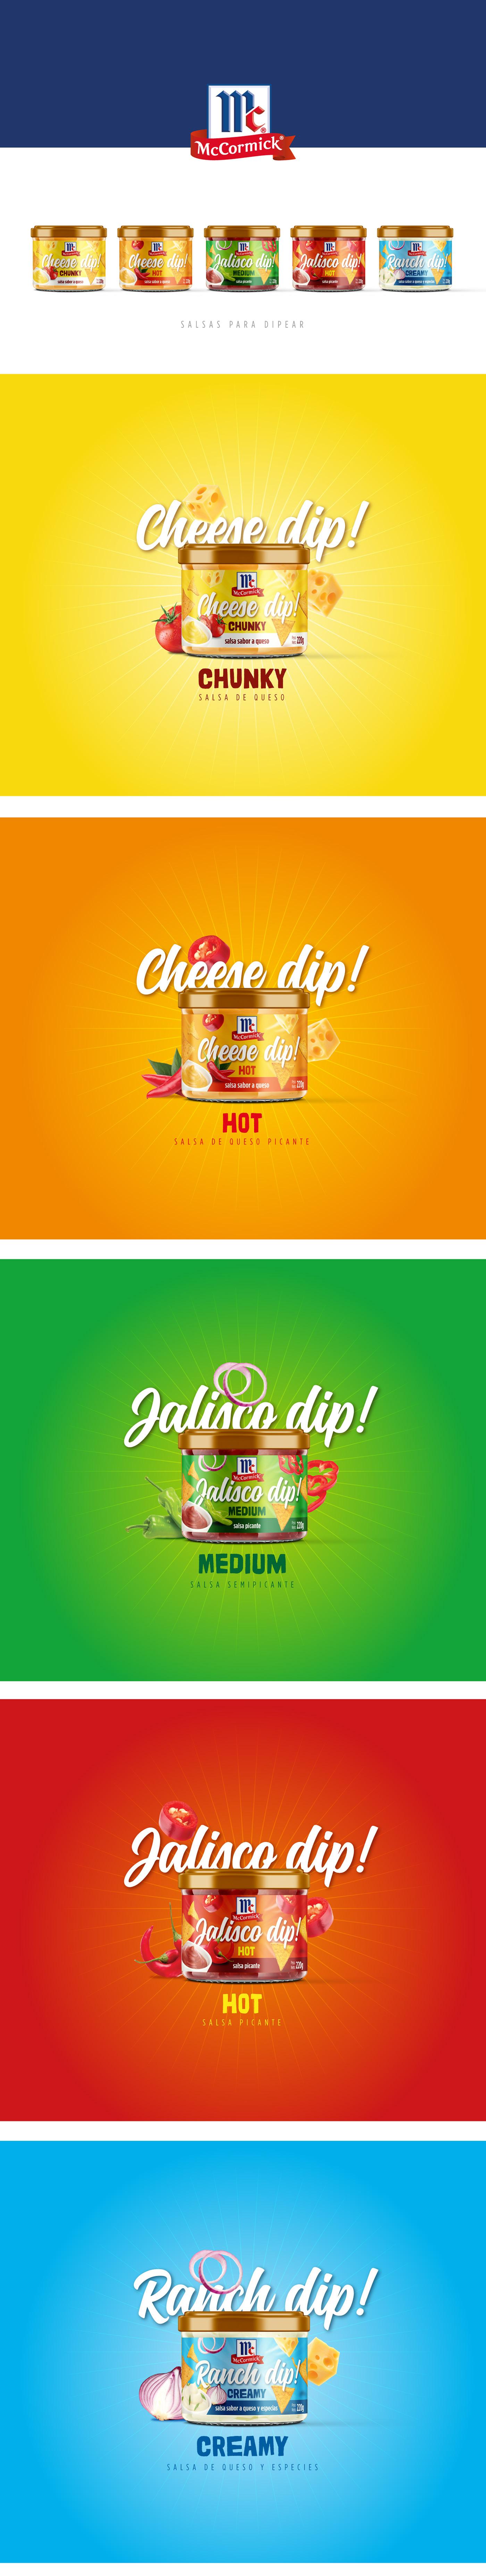 mc cormick Dip sauce Cheese jalisco alimec Ecuador Packaging Workshop design